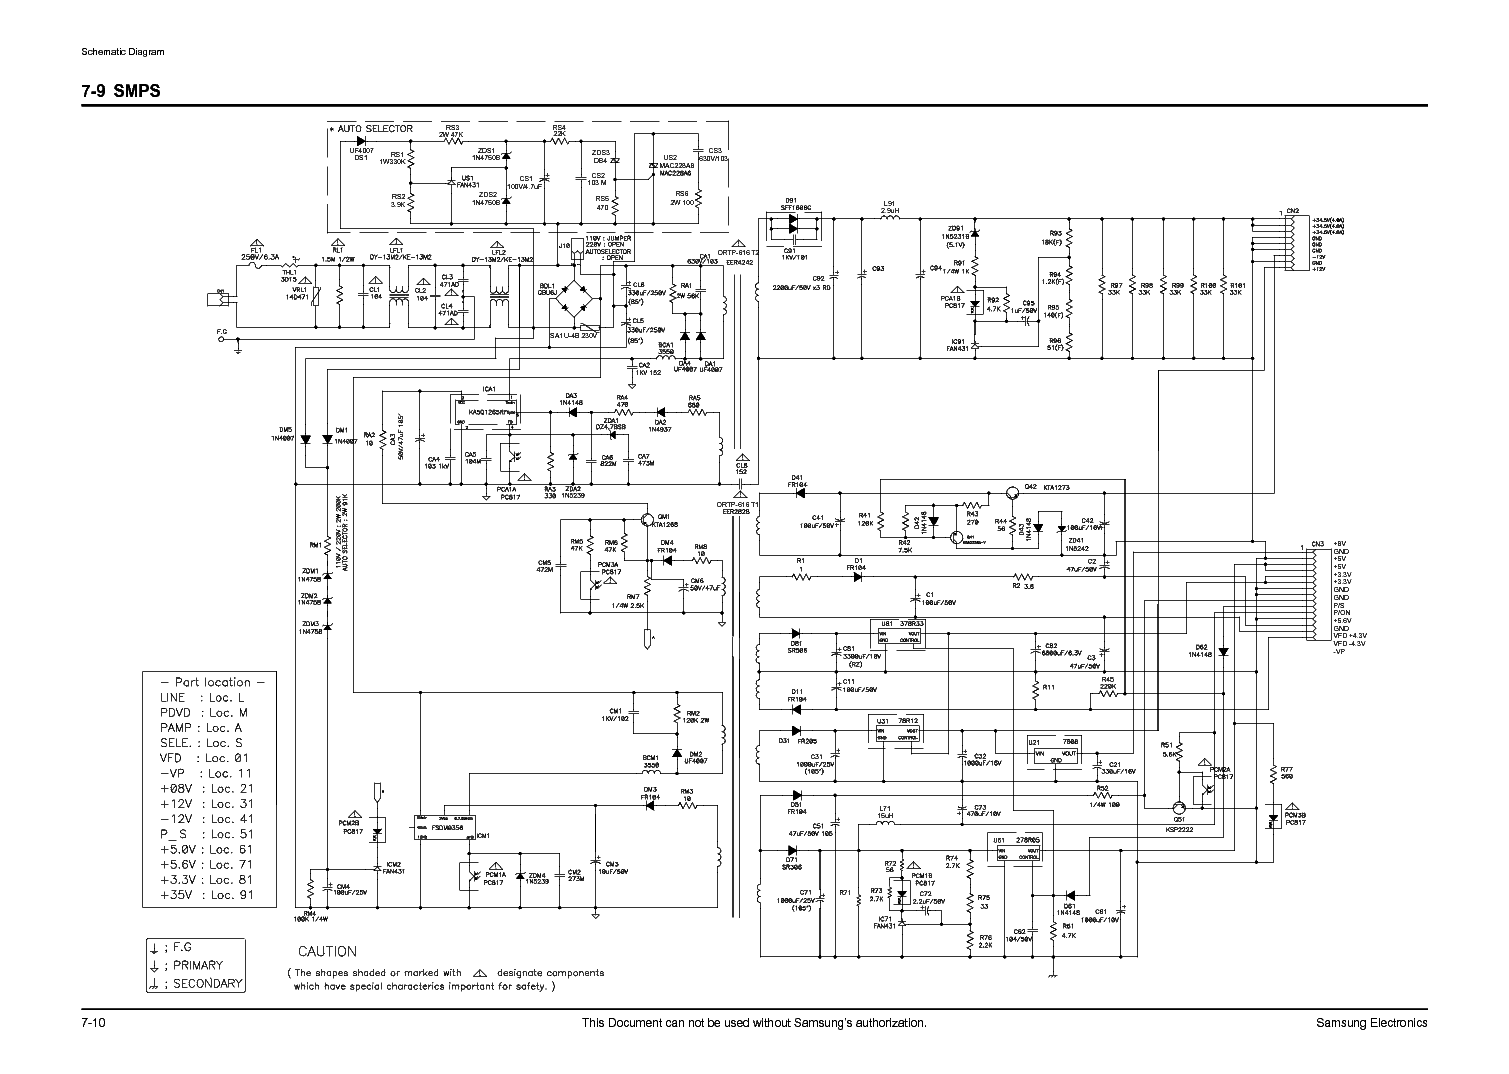 cinema maison samsung manual pdf